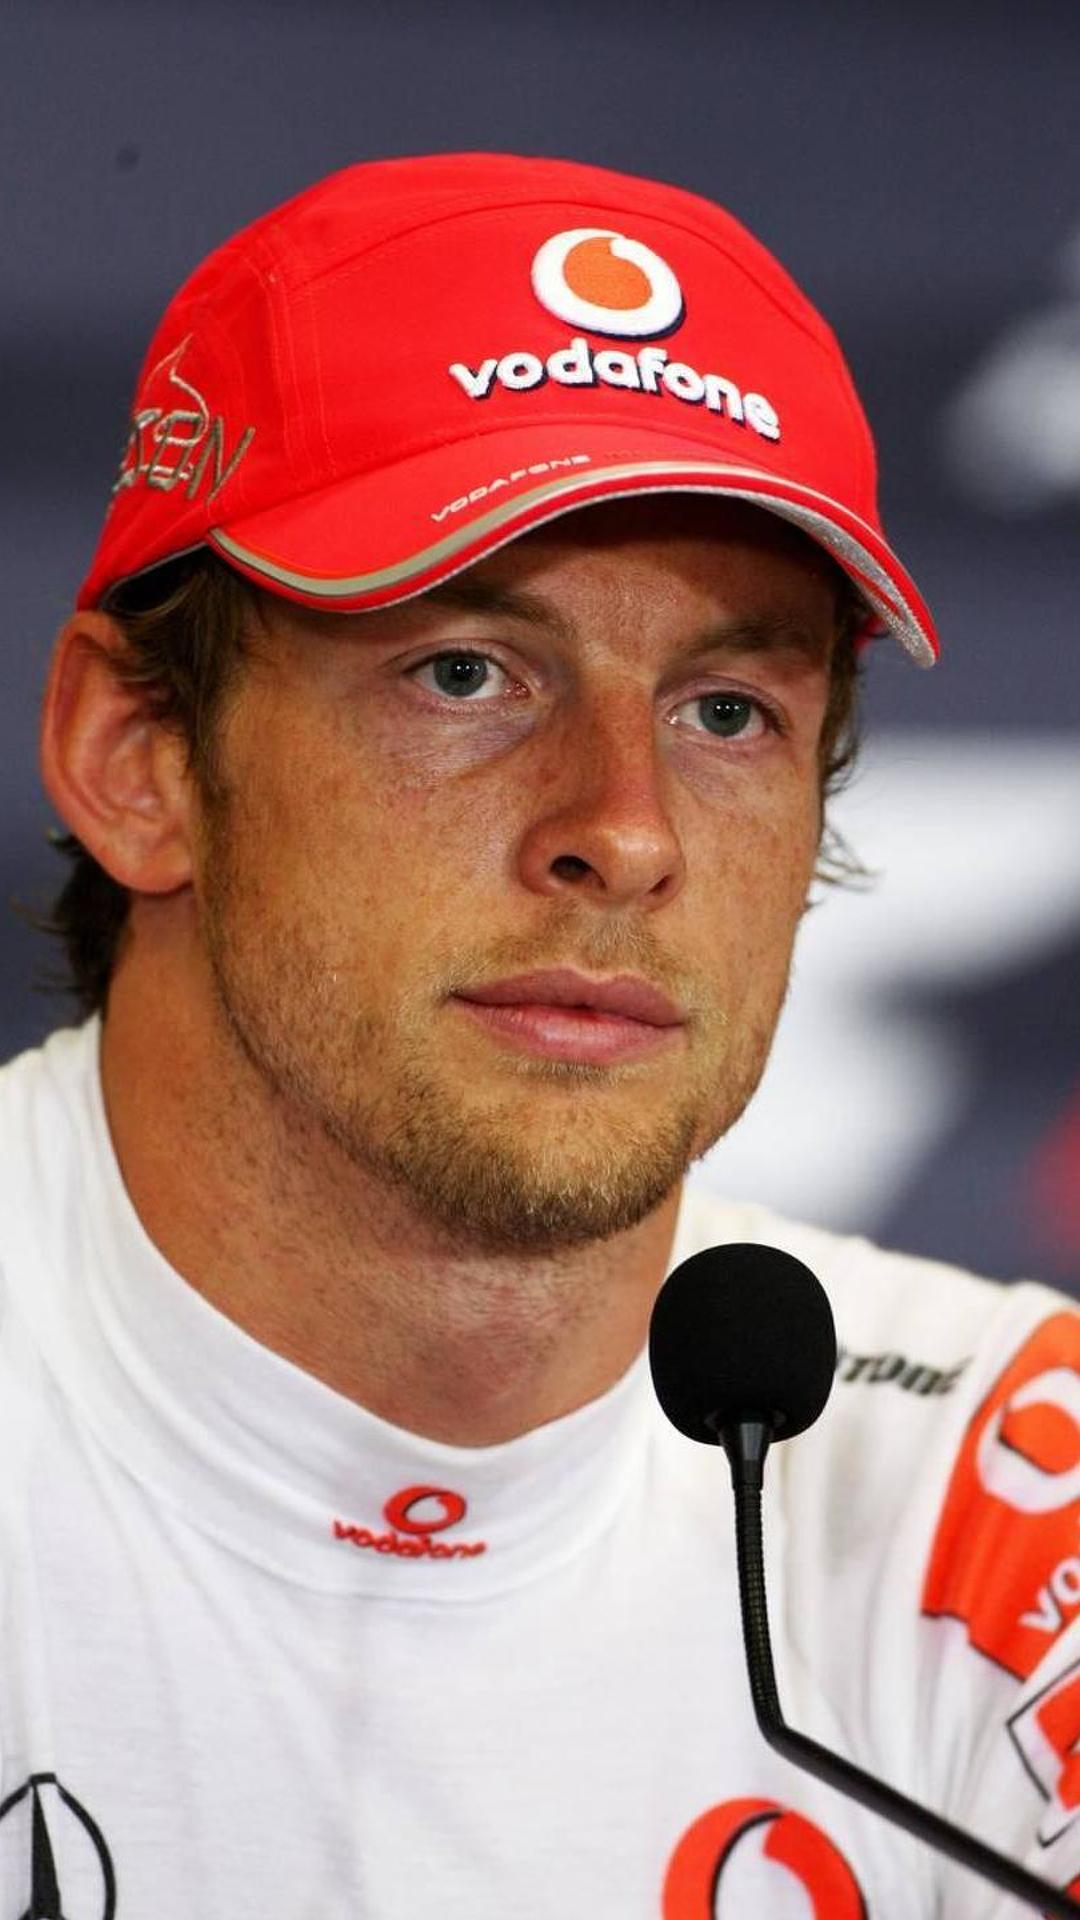 Marussia 'competitive' in 2014 - Button